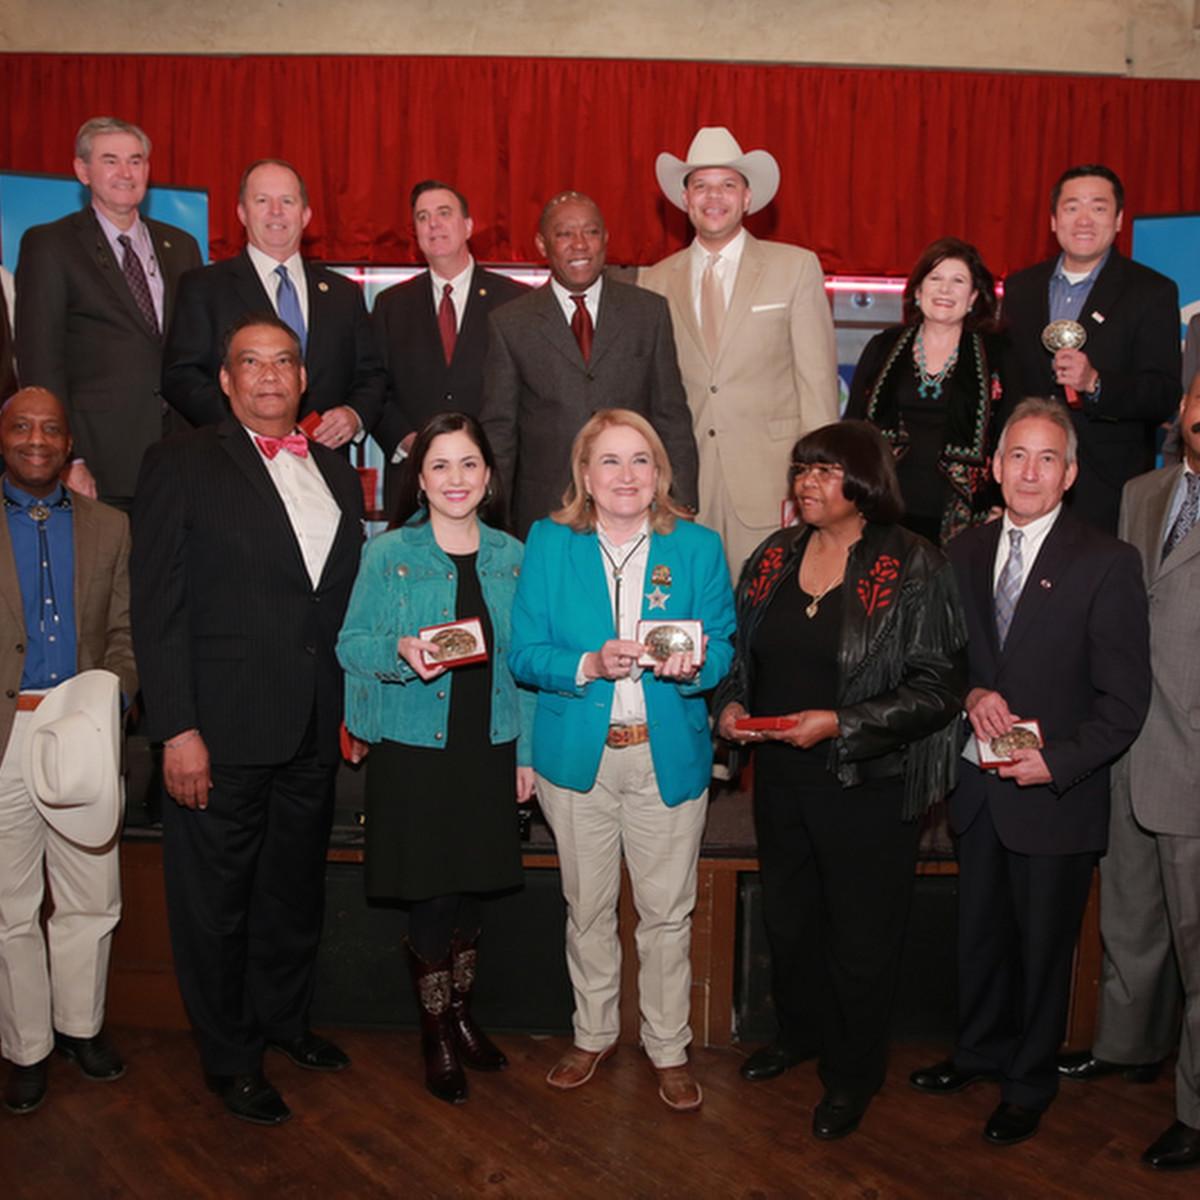 Members of Texas legislature at Mayor's Rodeo Kickoff Breakfast